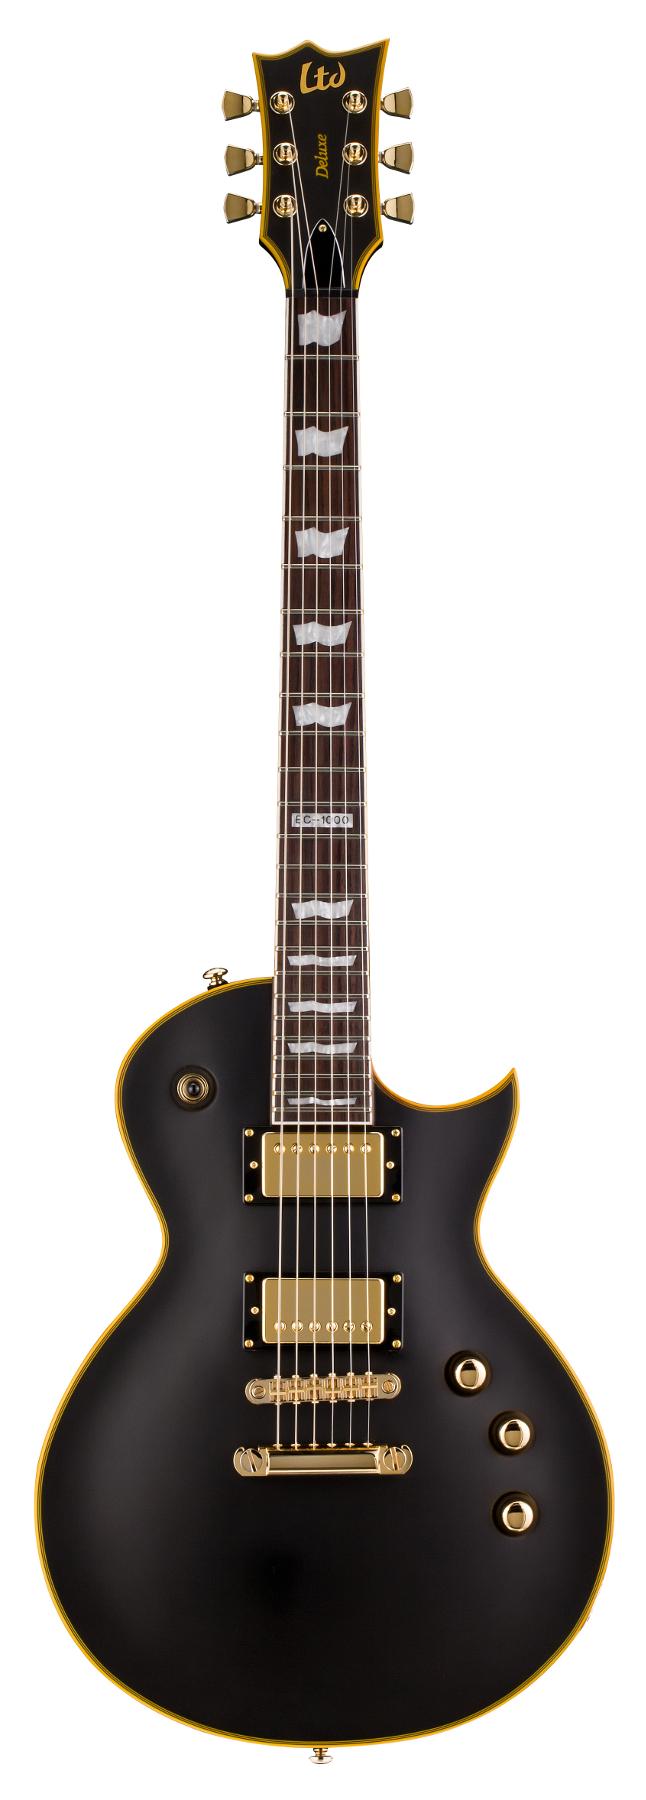 Electric Guitar, Vintage Black